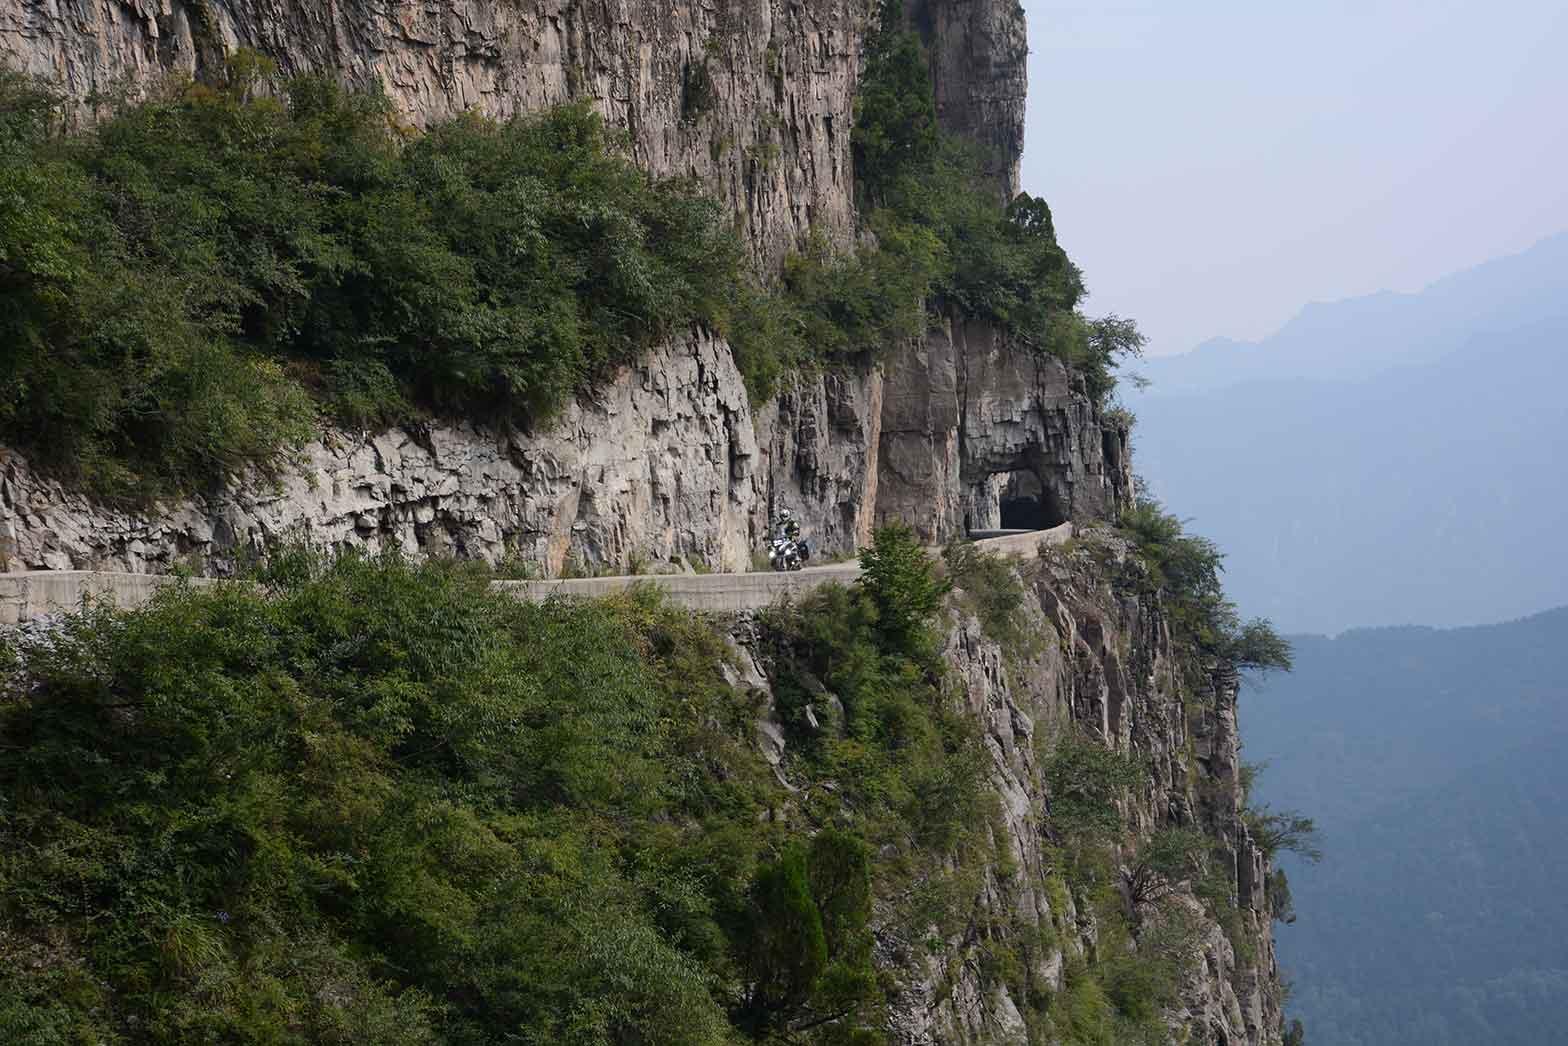 The Guoliang Tunnel, China